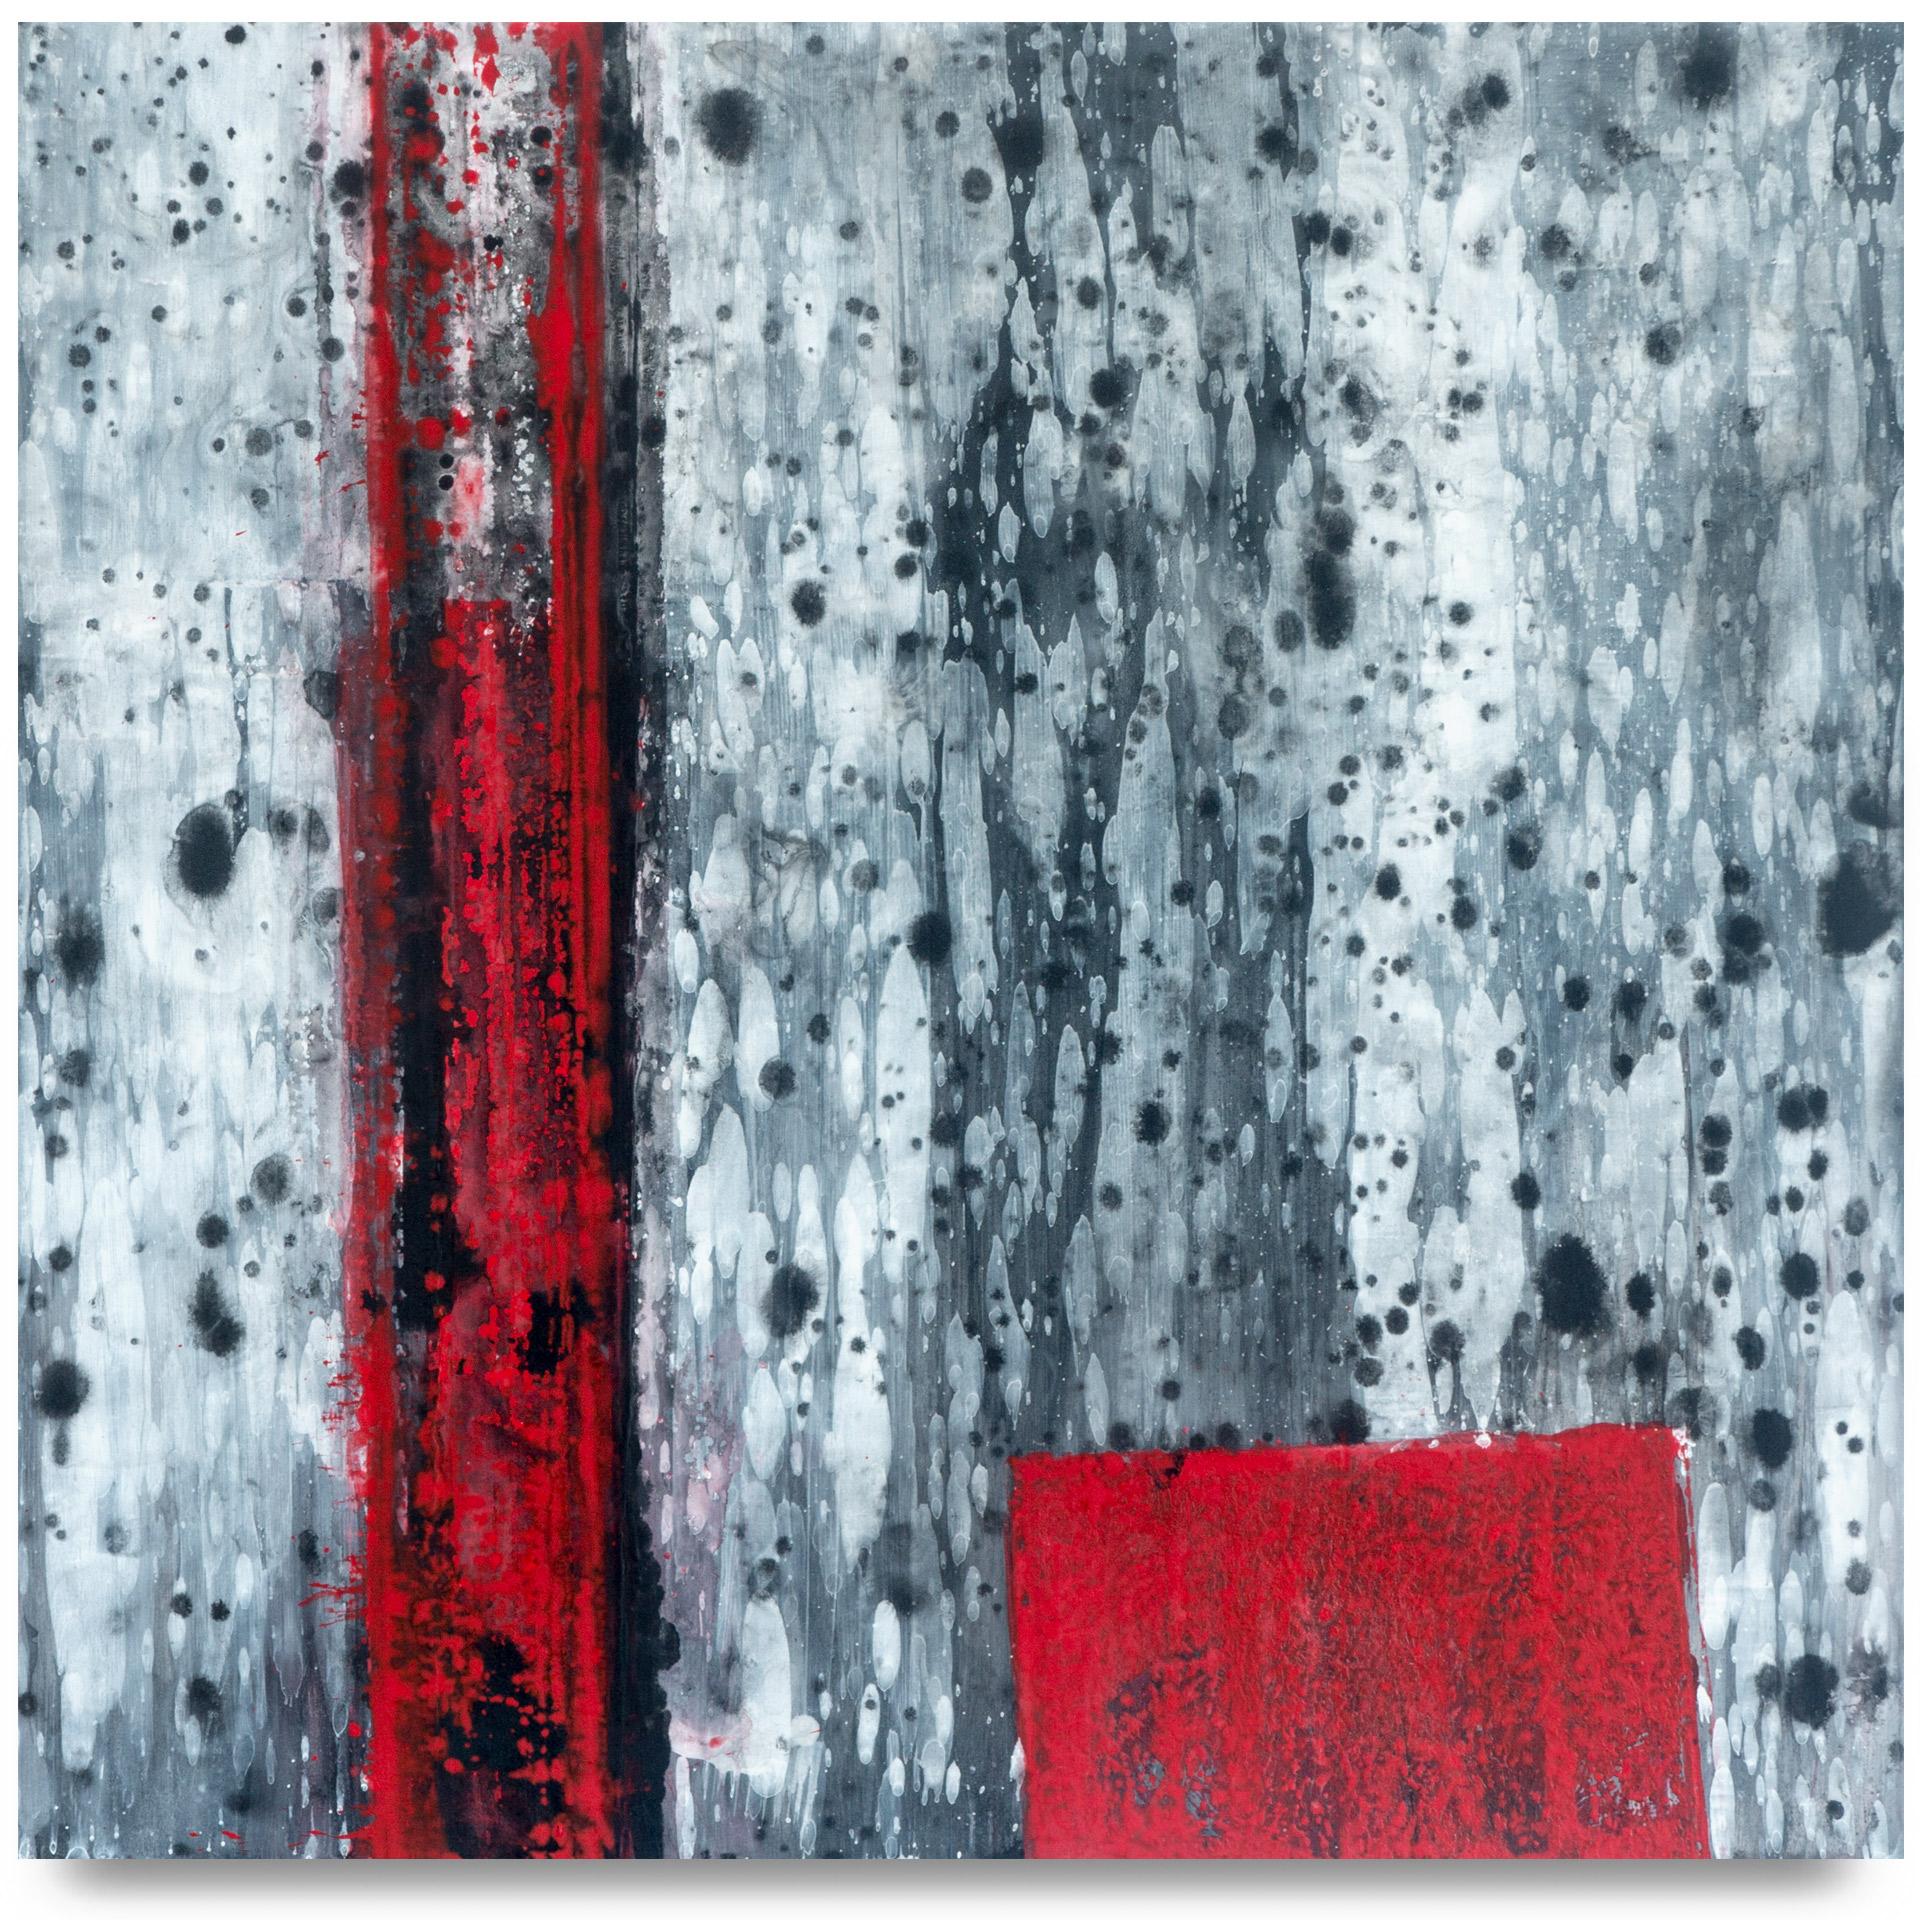 Bleeding Edge, 2014